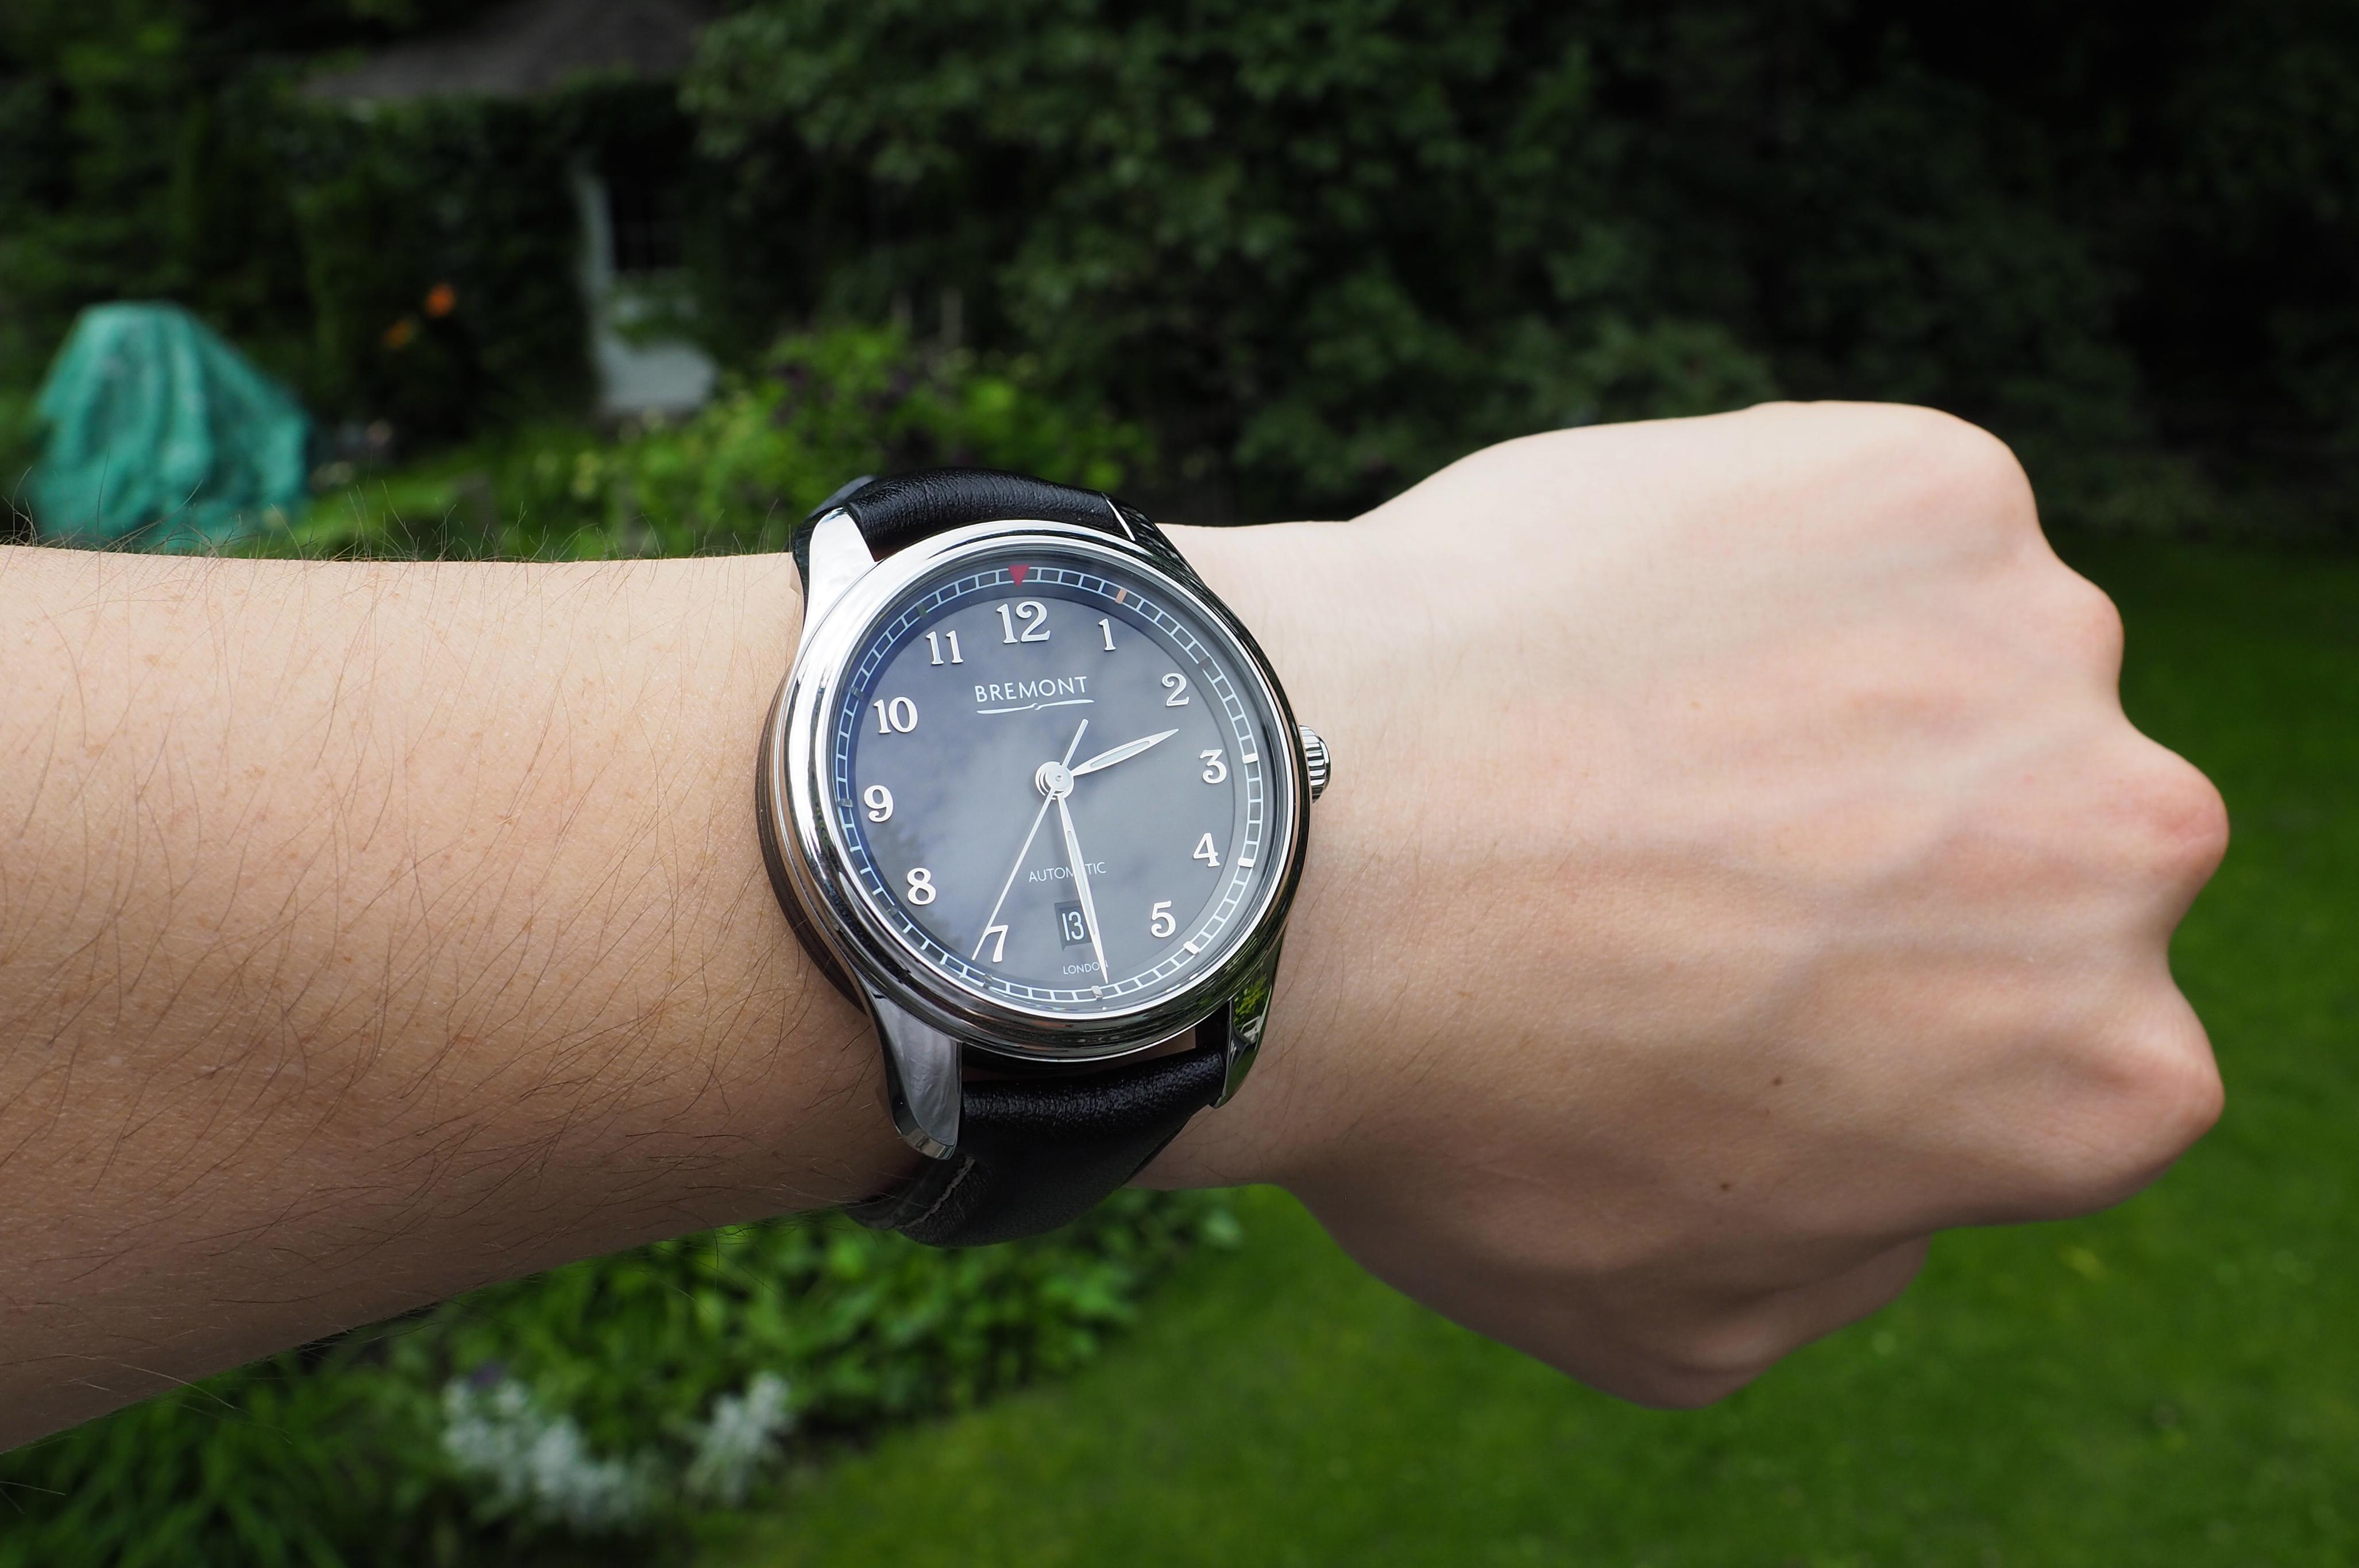 Mach 2 on the wrist